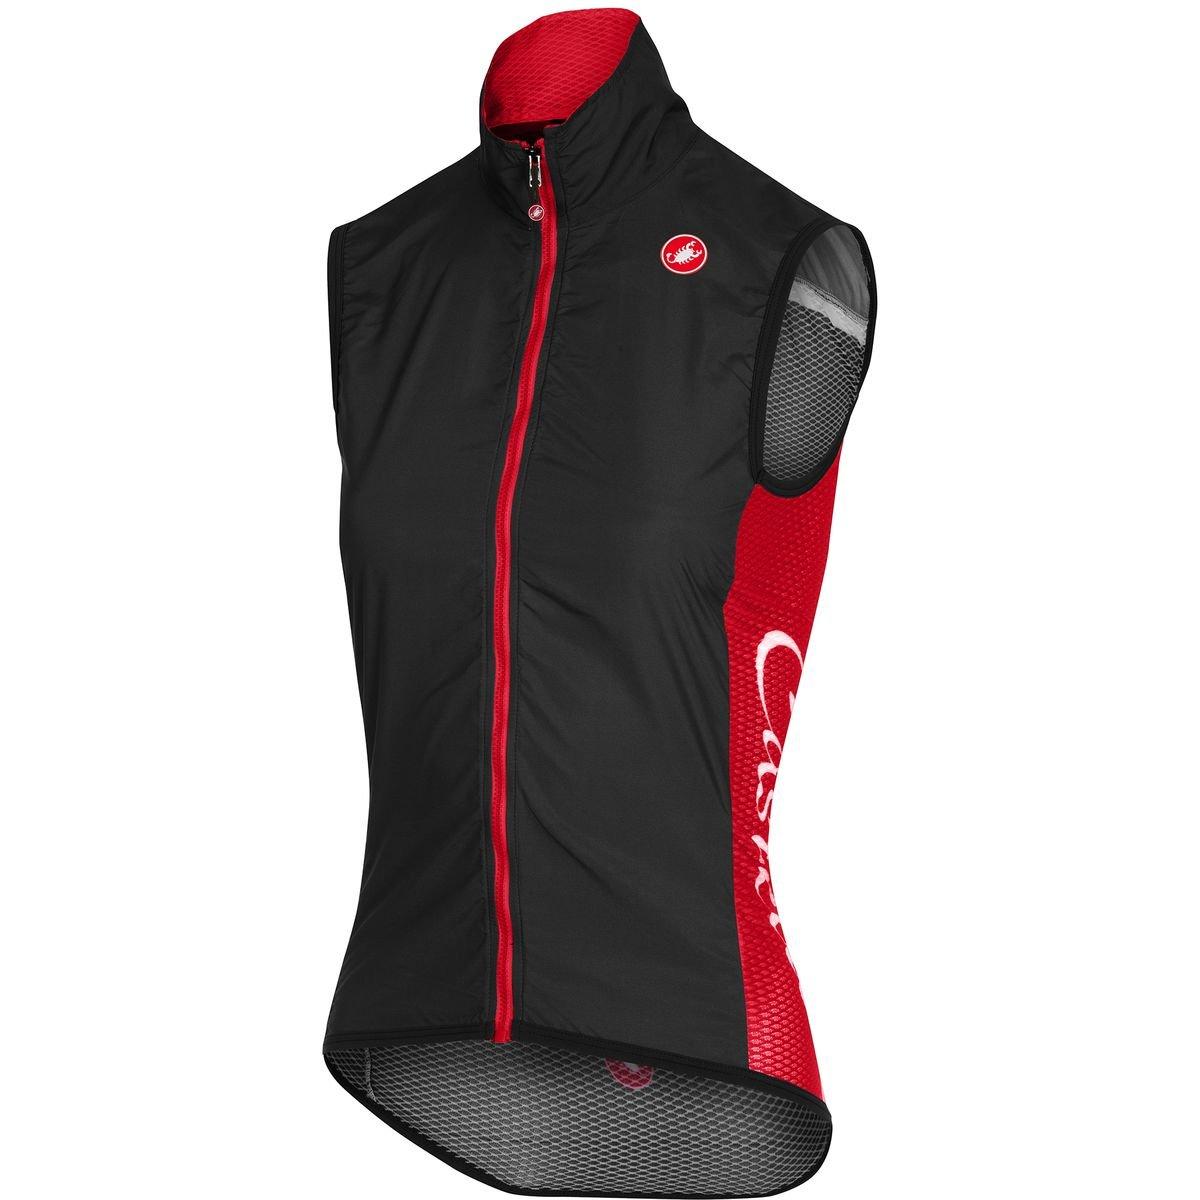 Castelli Pro Light Wind Vest - Women's Black, XS